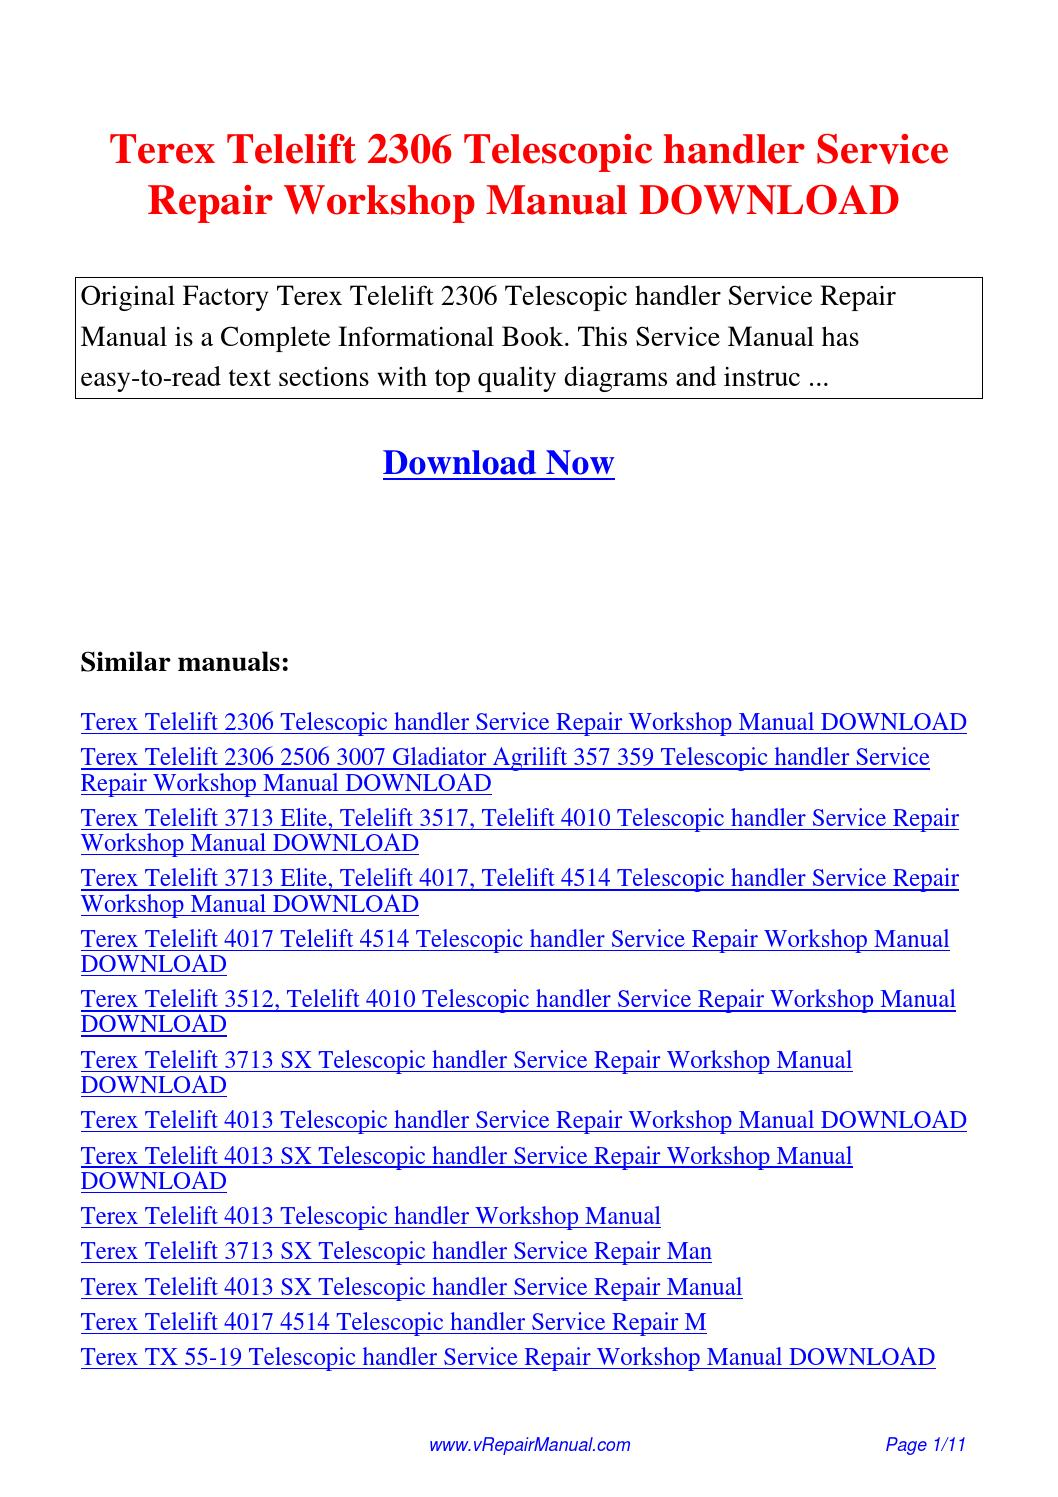 Terex Telelift 2306 Telescopic handler Service Repair Workshop Manual.pdf  by David Zhang - issuu